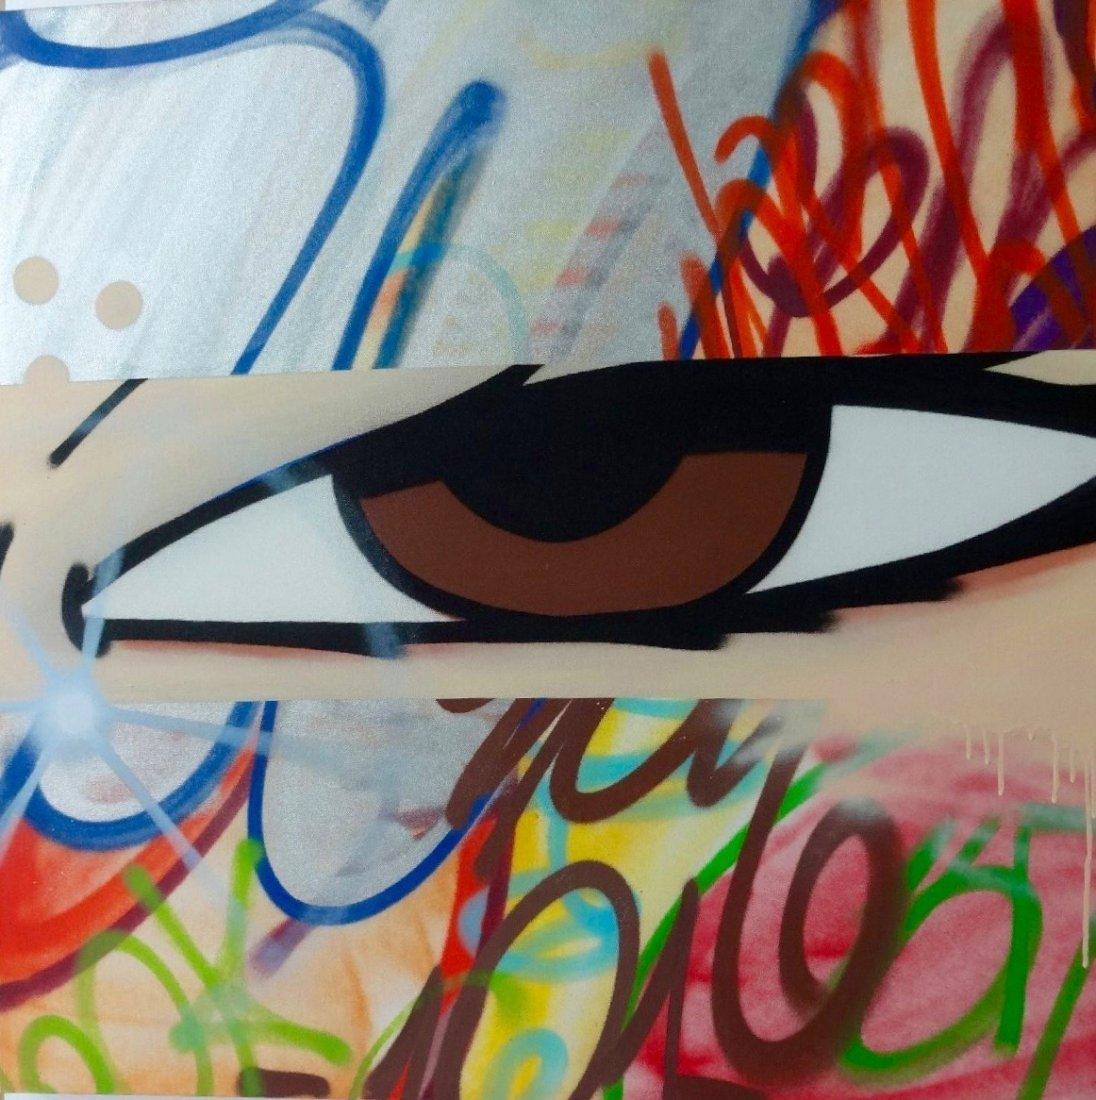 CRASH Grafitti Street Art on Canvas